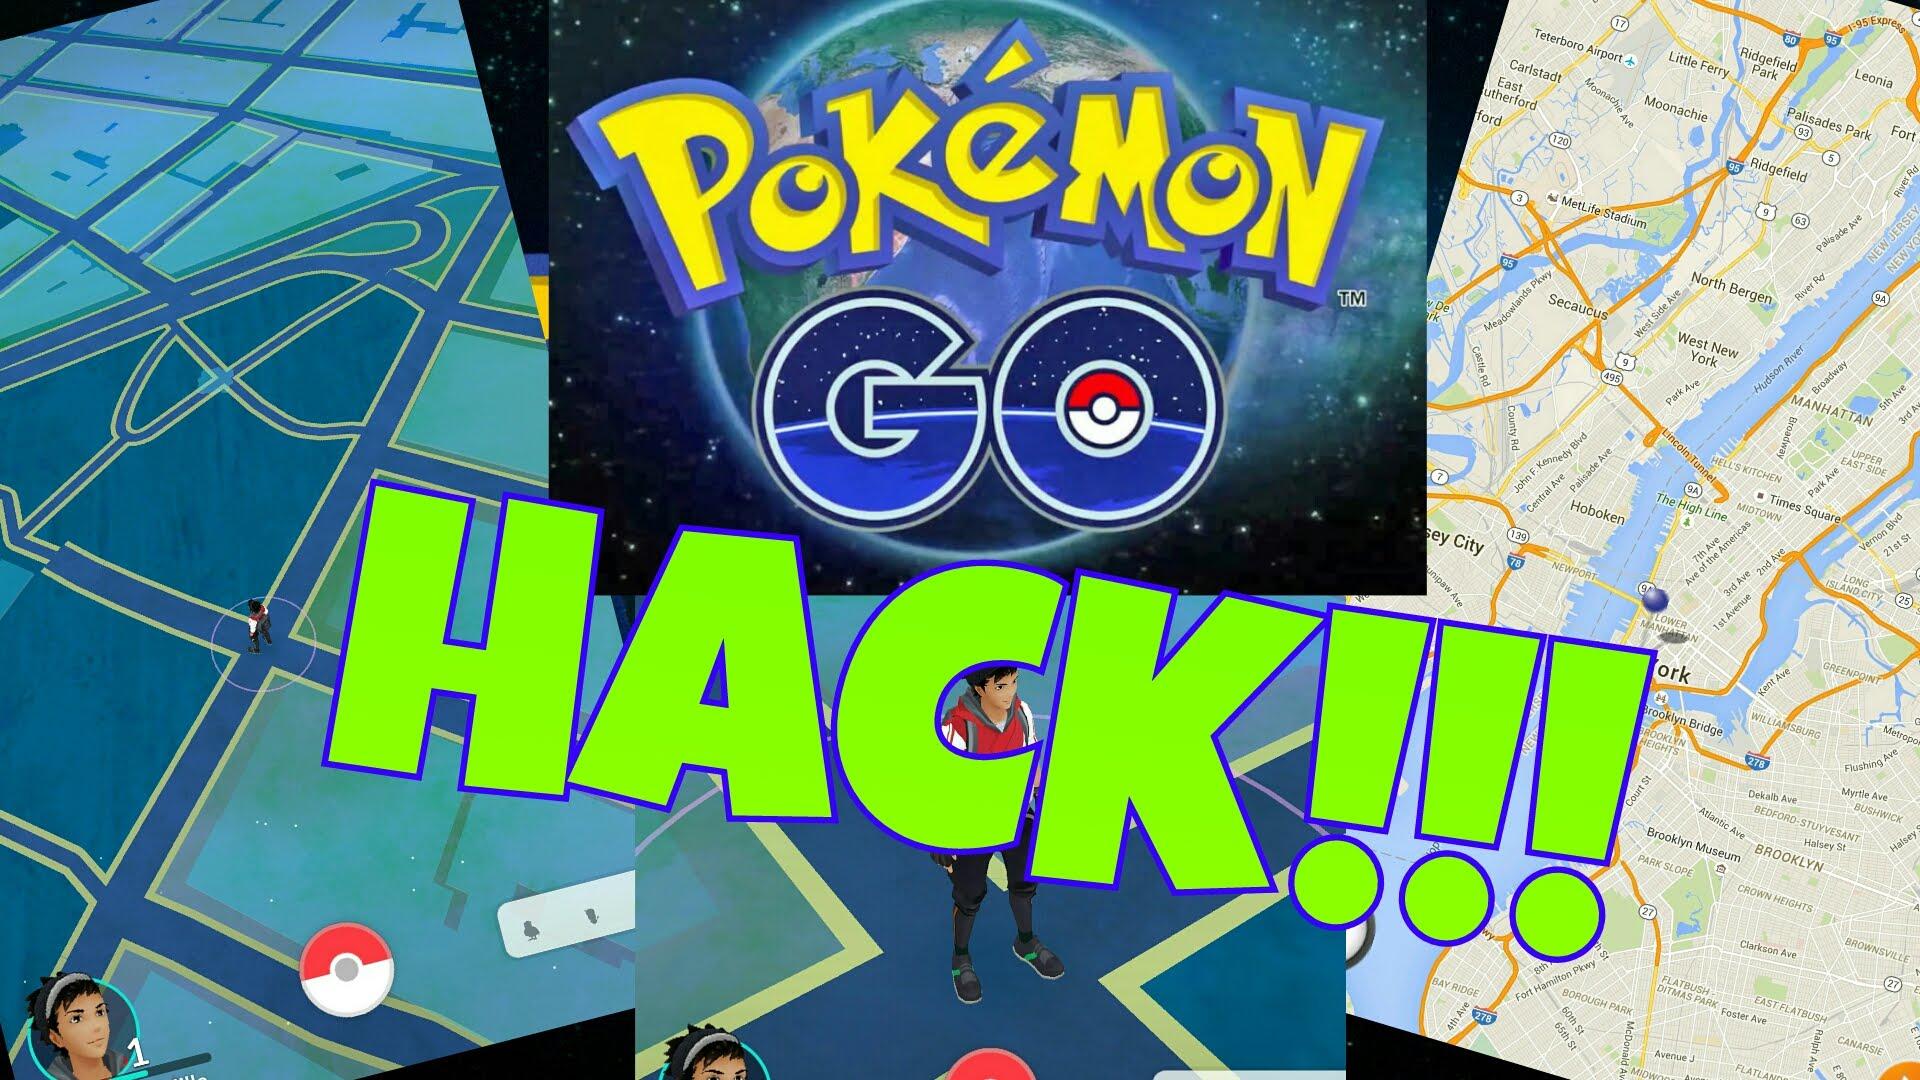 Pokemon Go Hack for Android - No Root - Pokemon Go Mod - Rev Kid